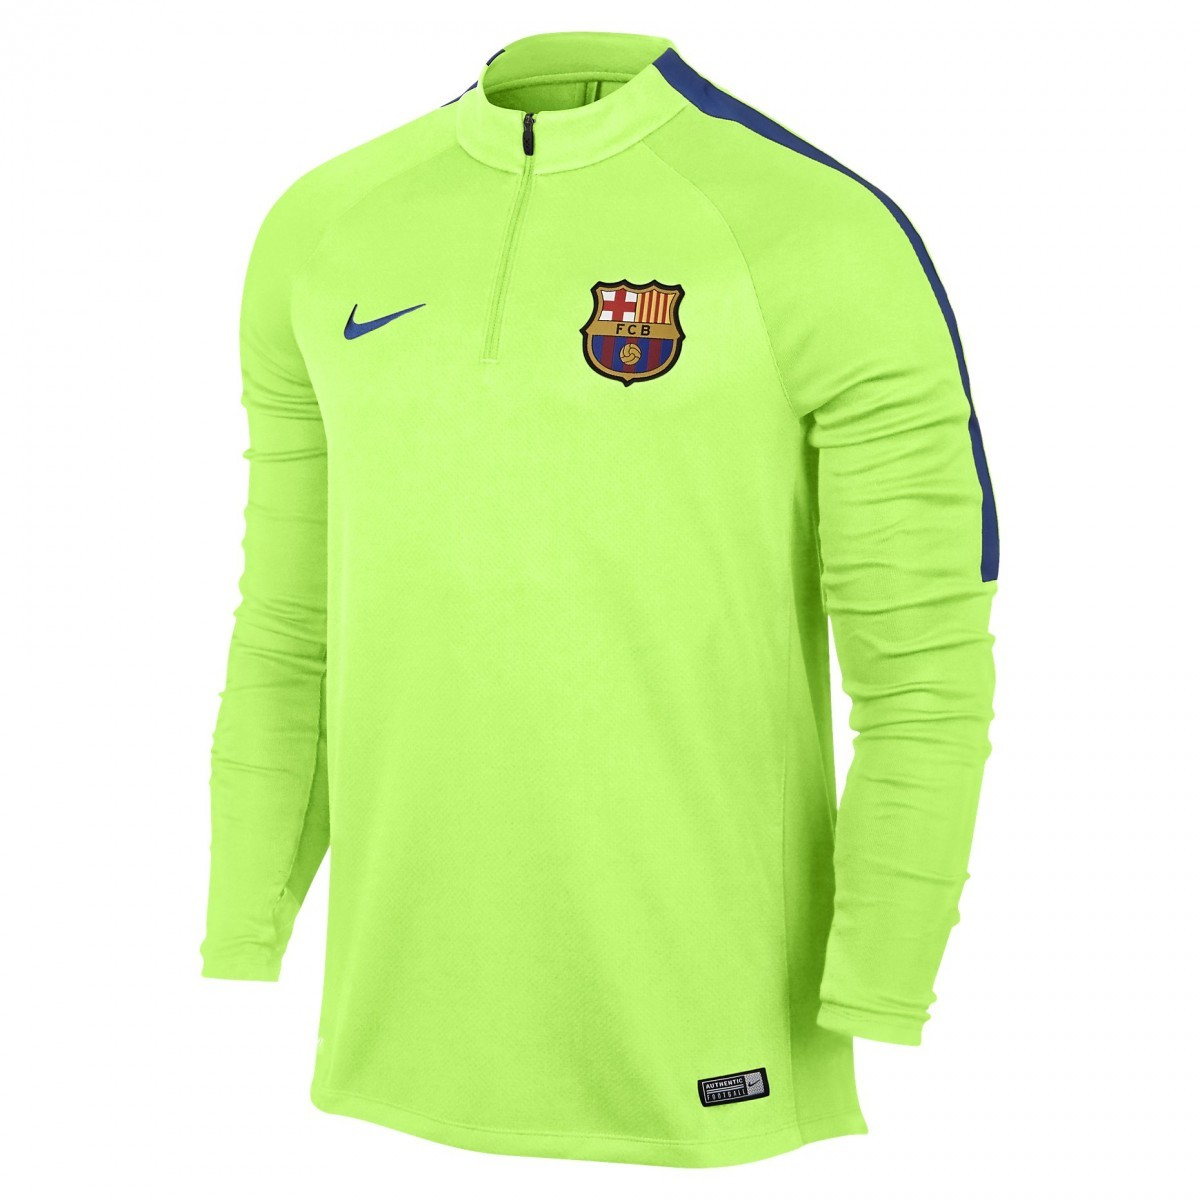 3101f8610b8 Football Maillots Squad FC Barcelona. Prix réduit ! NIKE 808922-369 FCB.  Loading zoom